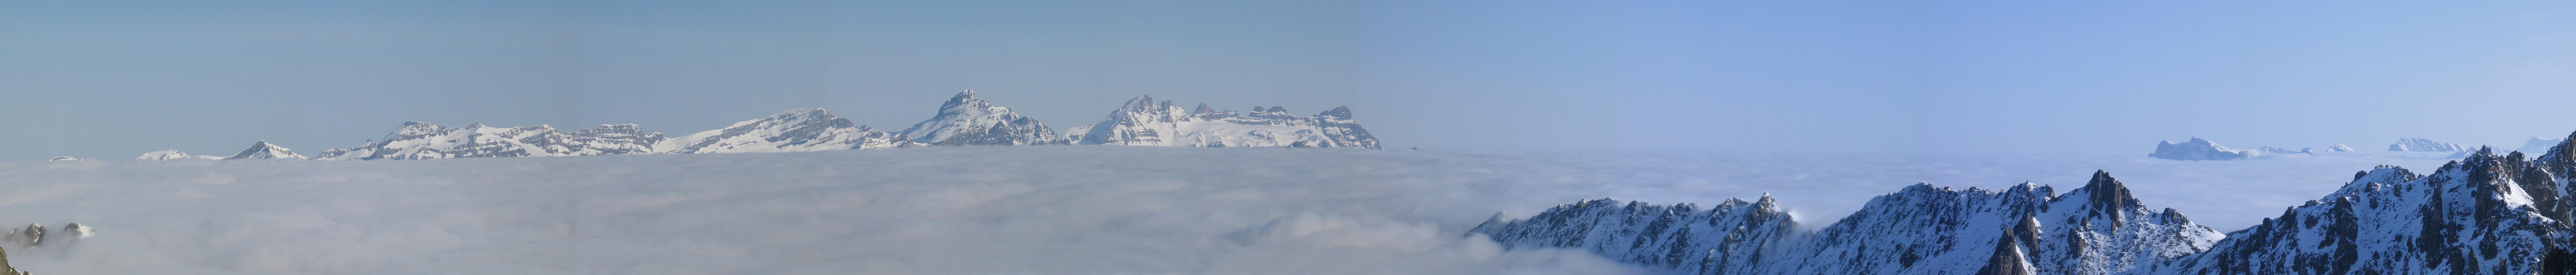 Cabane Trient Walliser Alpen / Alpes valaisannes Schweiz panorama 17